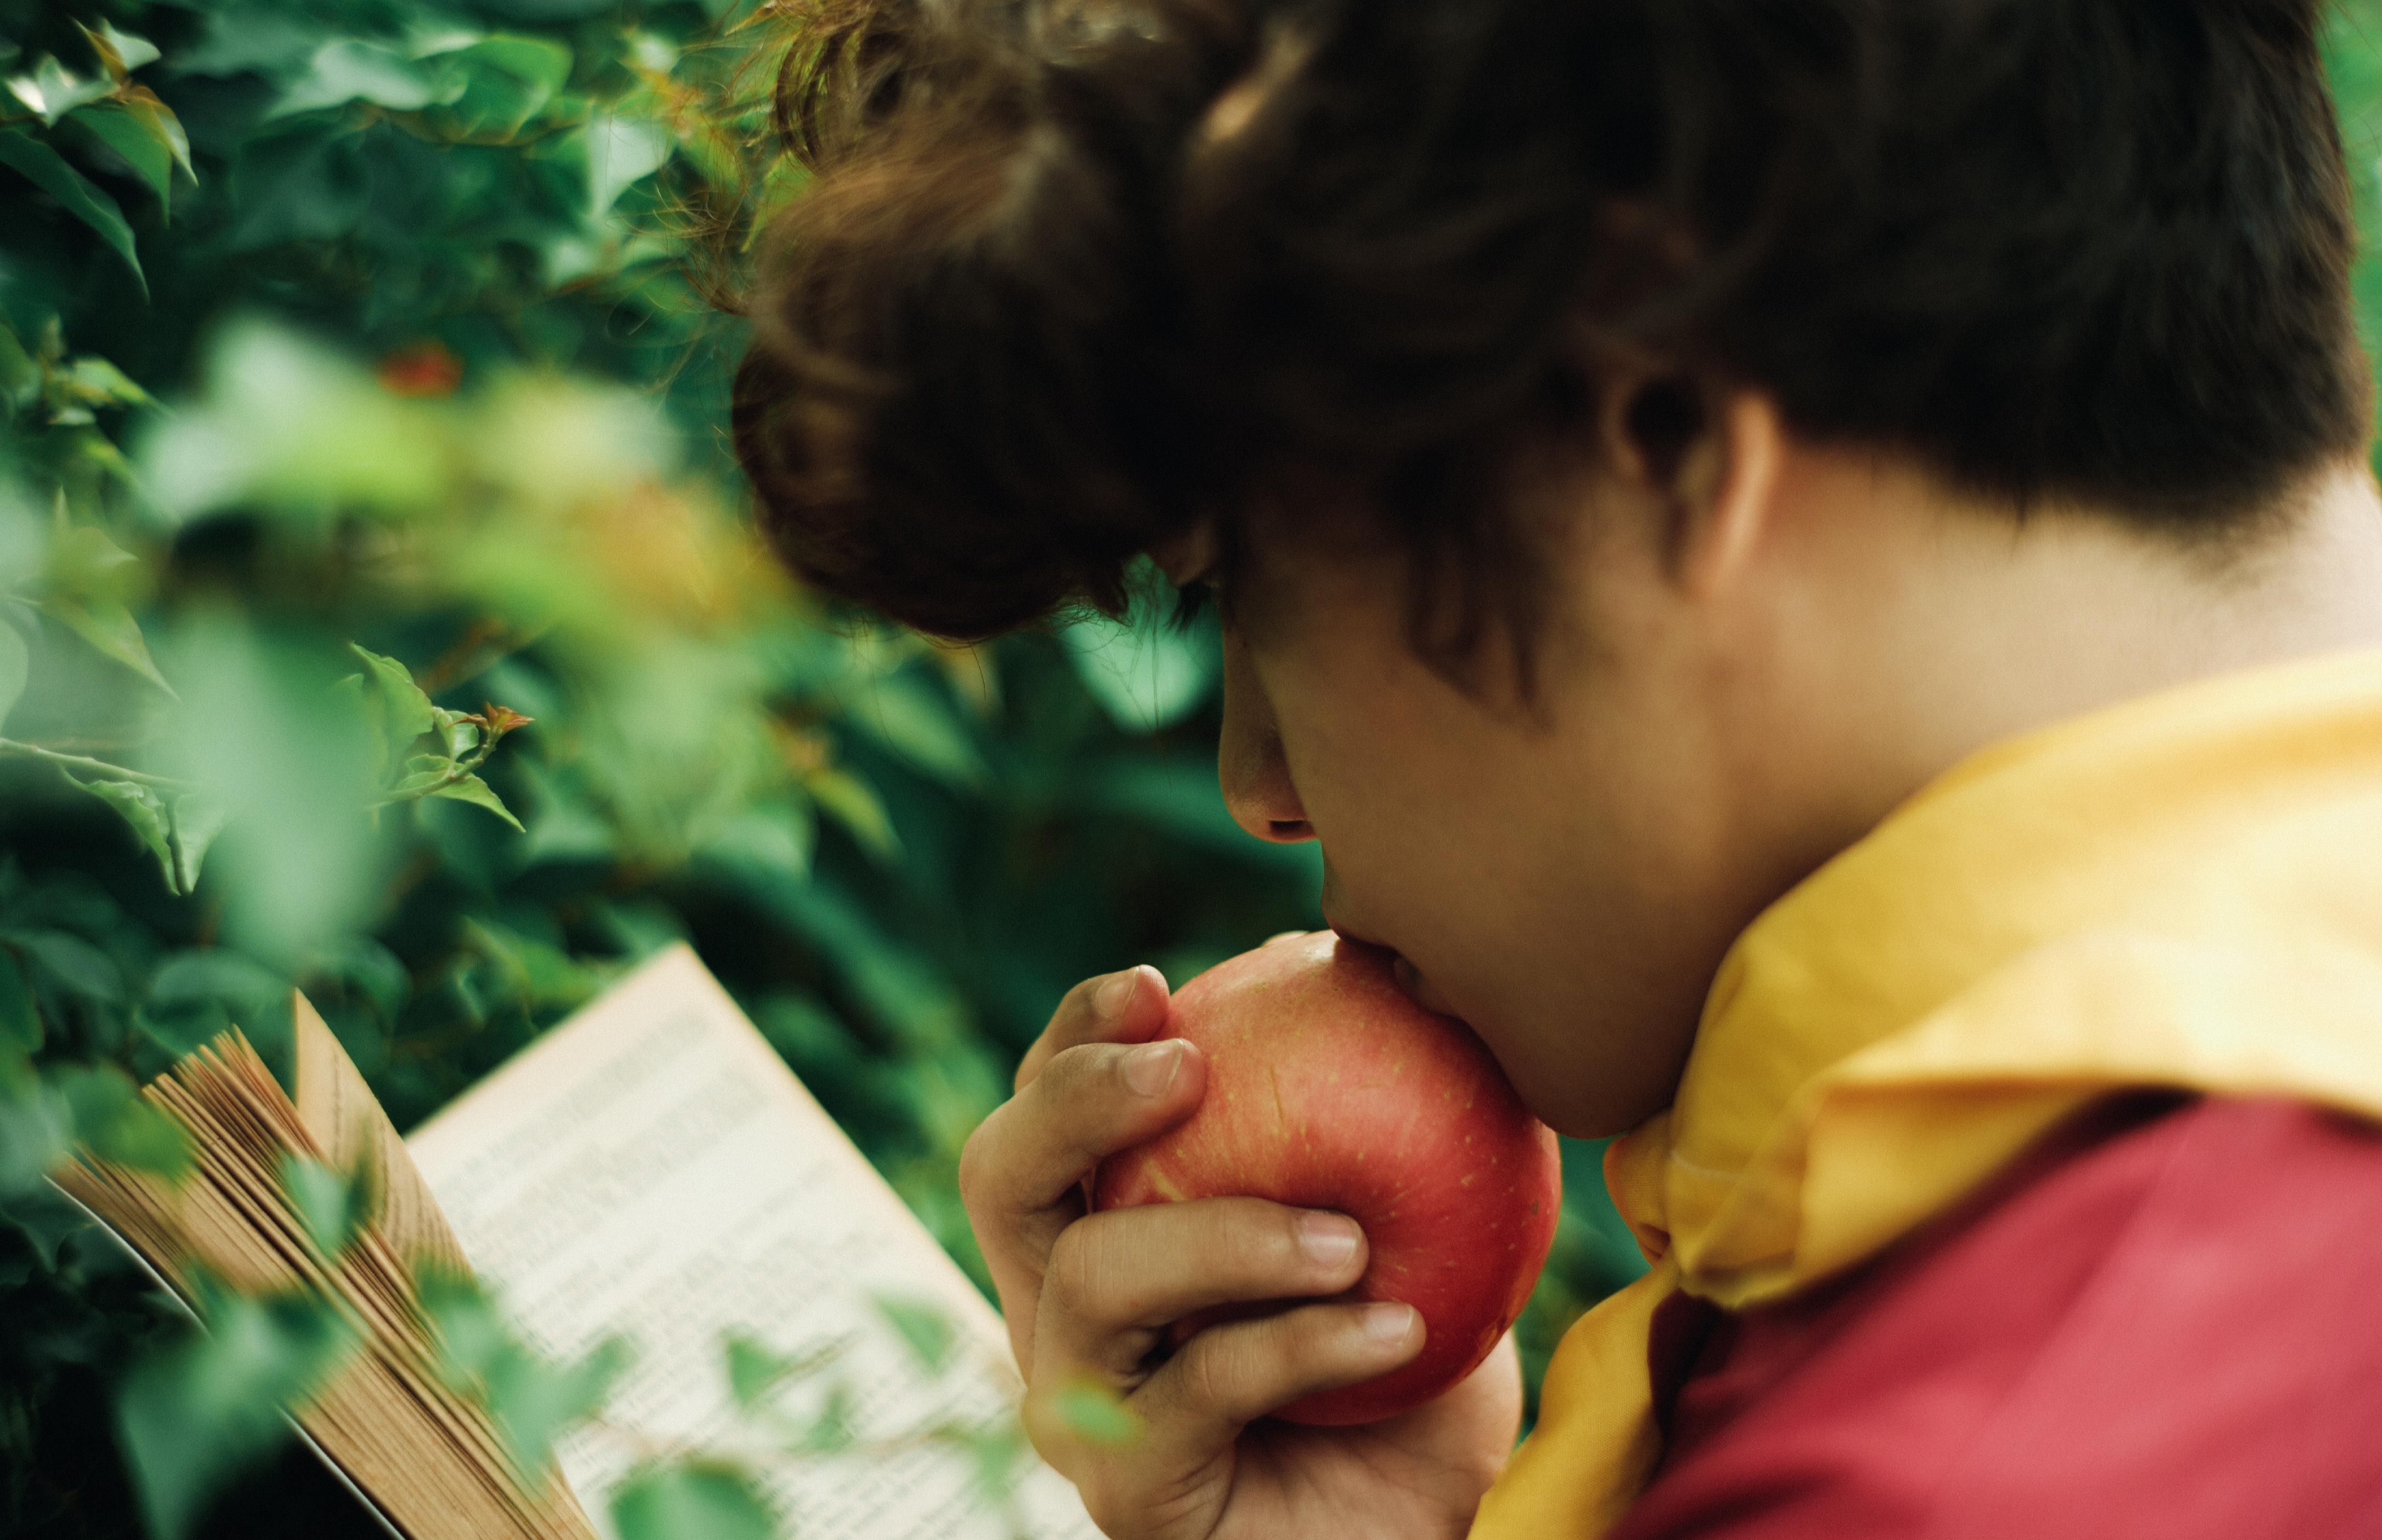 Photo Of Man Eating Apple